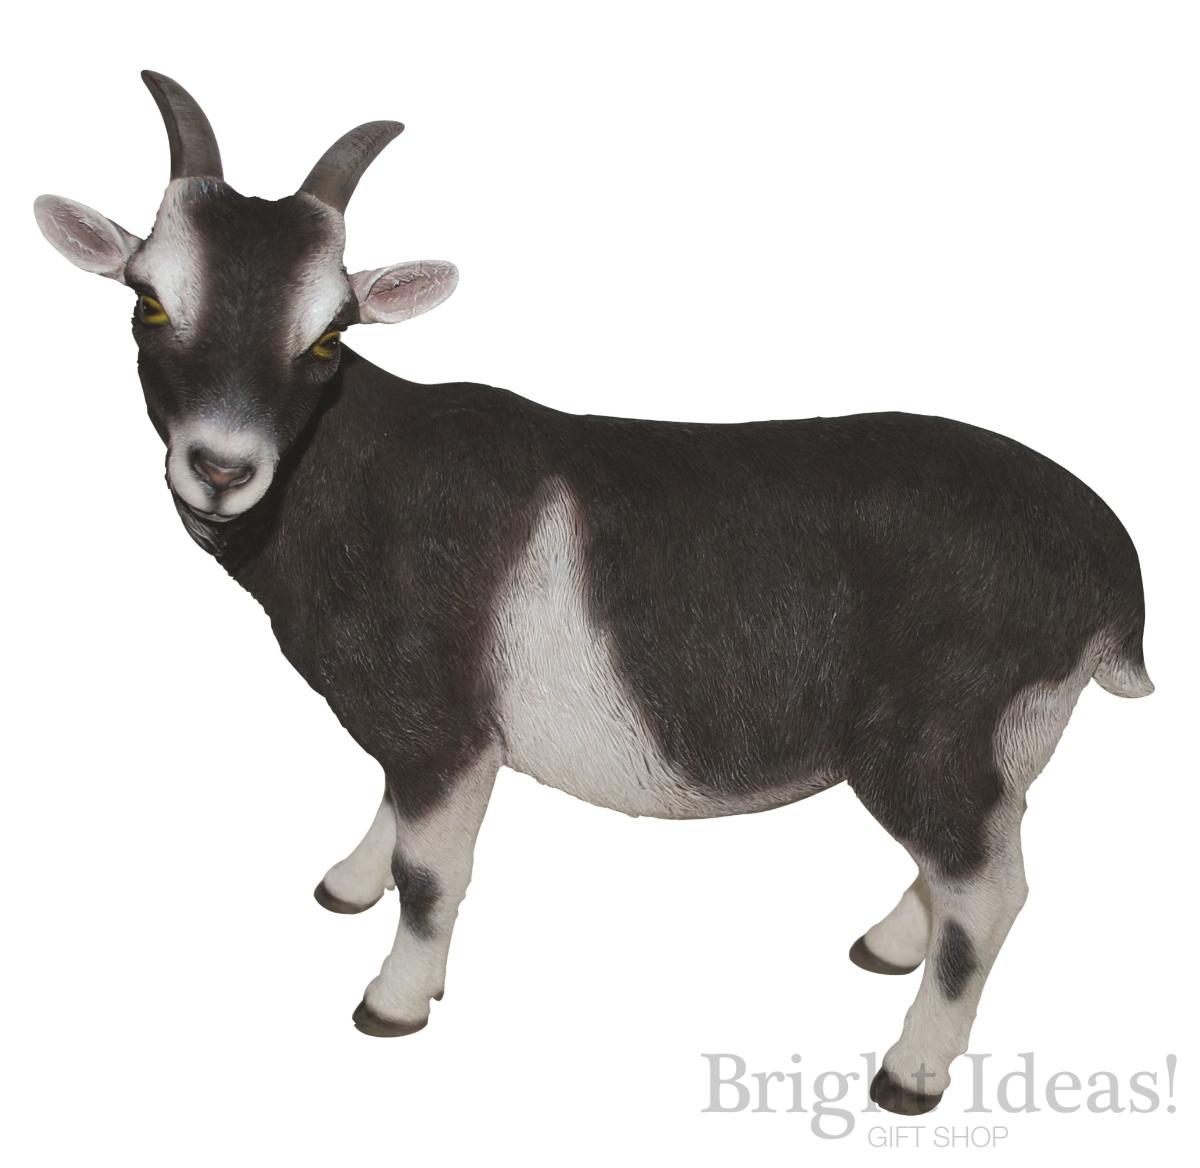 Goat Real Life Goats Farm Animals By Vivid Arts Xrl Goat D